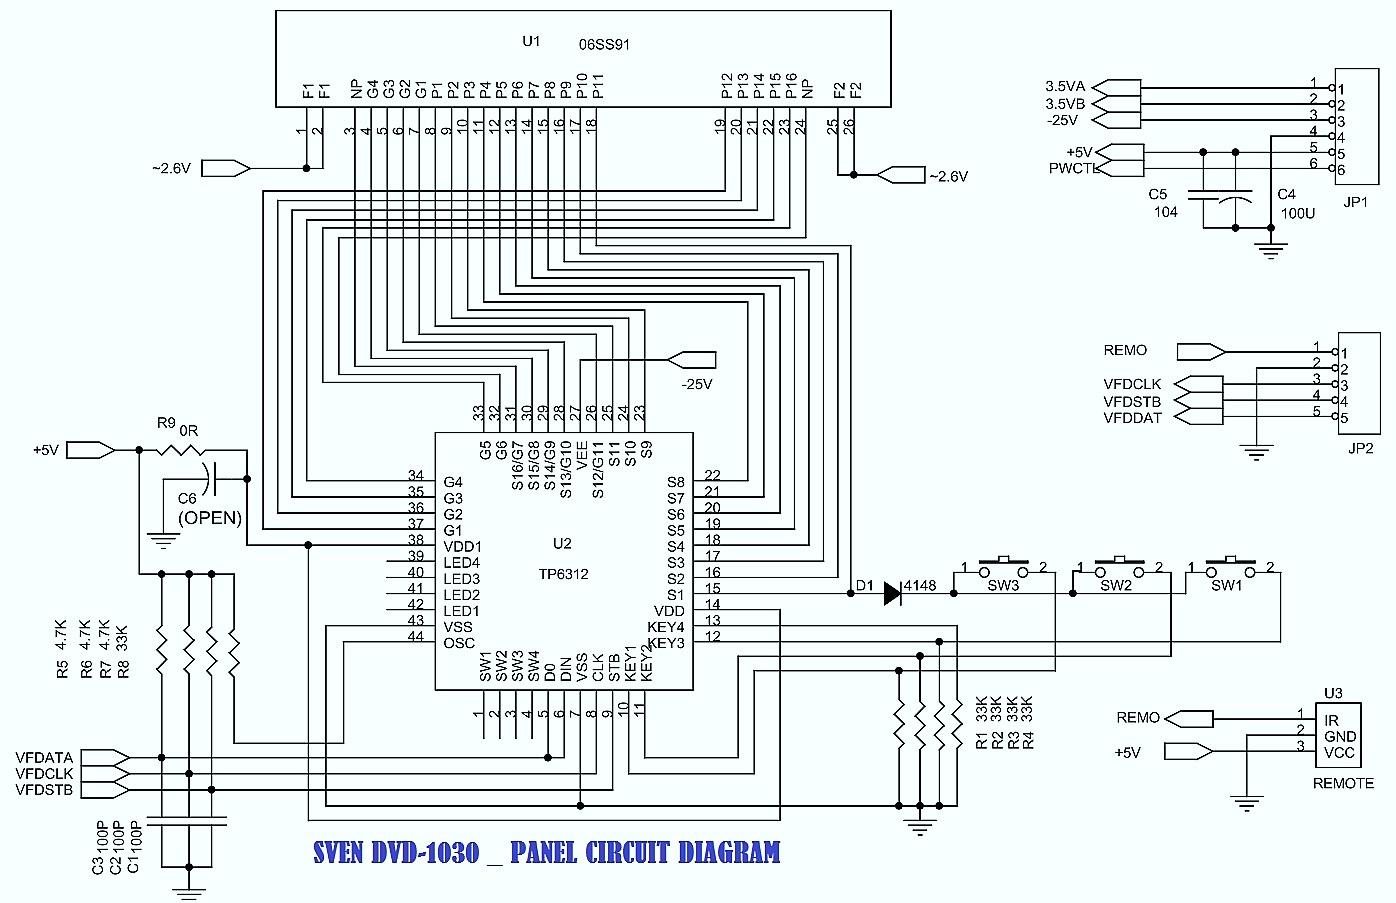 small resolution of hyundai veloster wiring diagram circuit diagrams hyundai 2001 hyundai tiburon radio wiring diagram hyundai tiburon radio